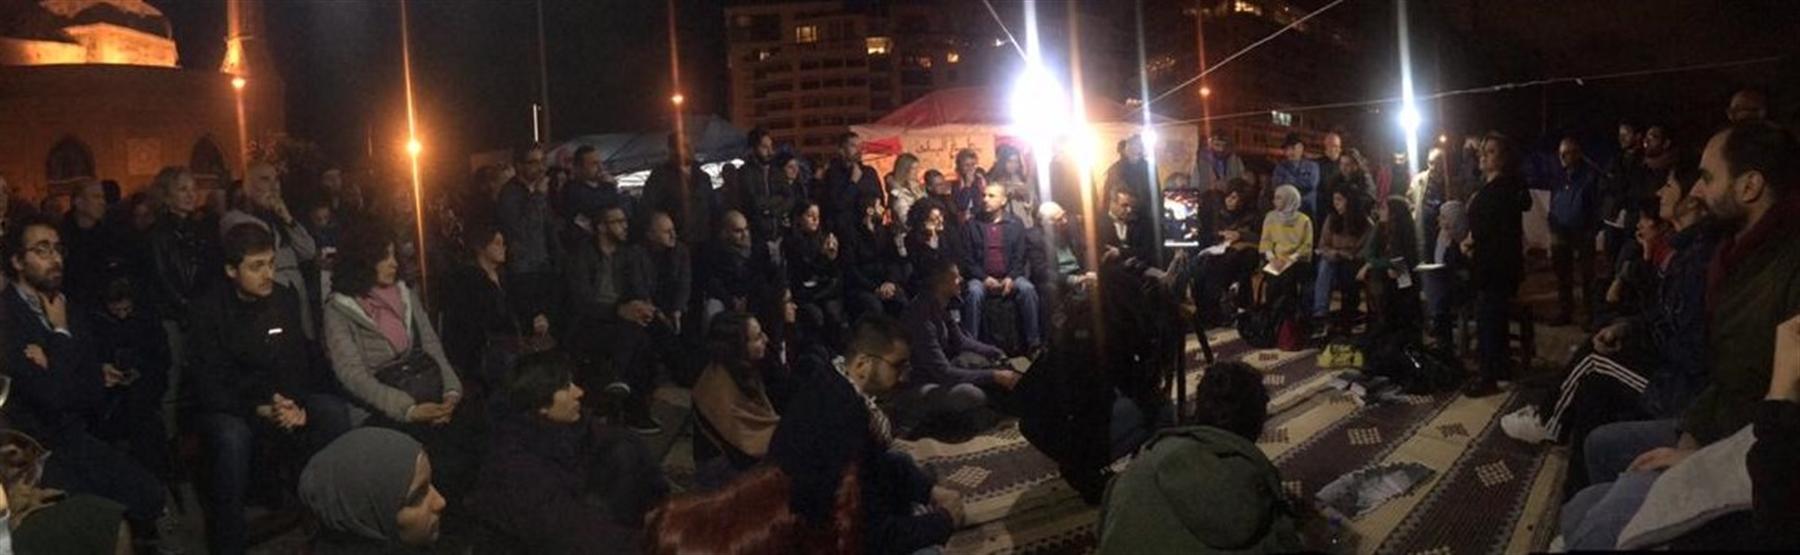 Abir Zaatari, Mona Fawaz, Yara Nahle, and Soha Mneimneh present the lab's work on housing in a public debate organized in the streets by urban activists (Photo Isabela Serhan, December 2019)